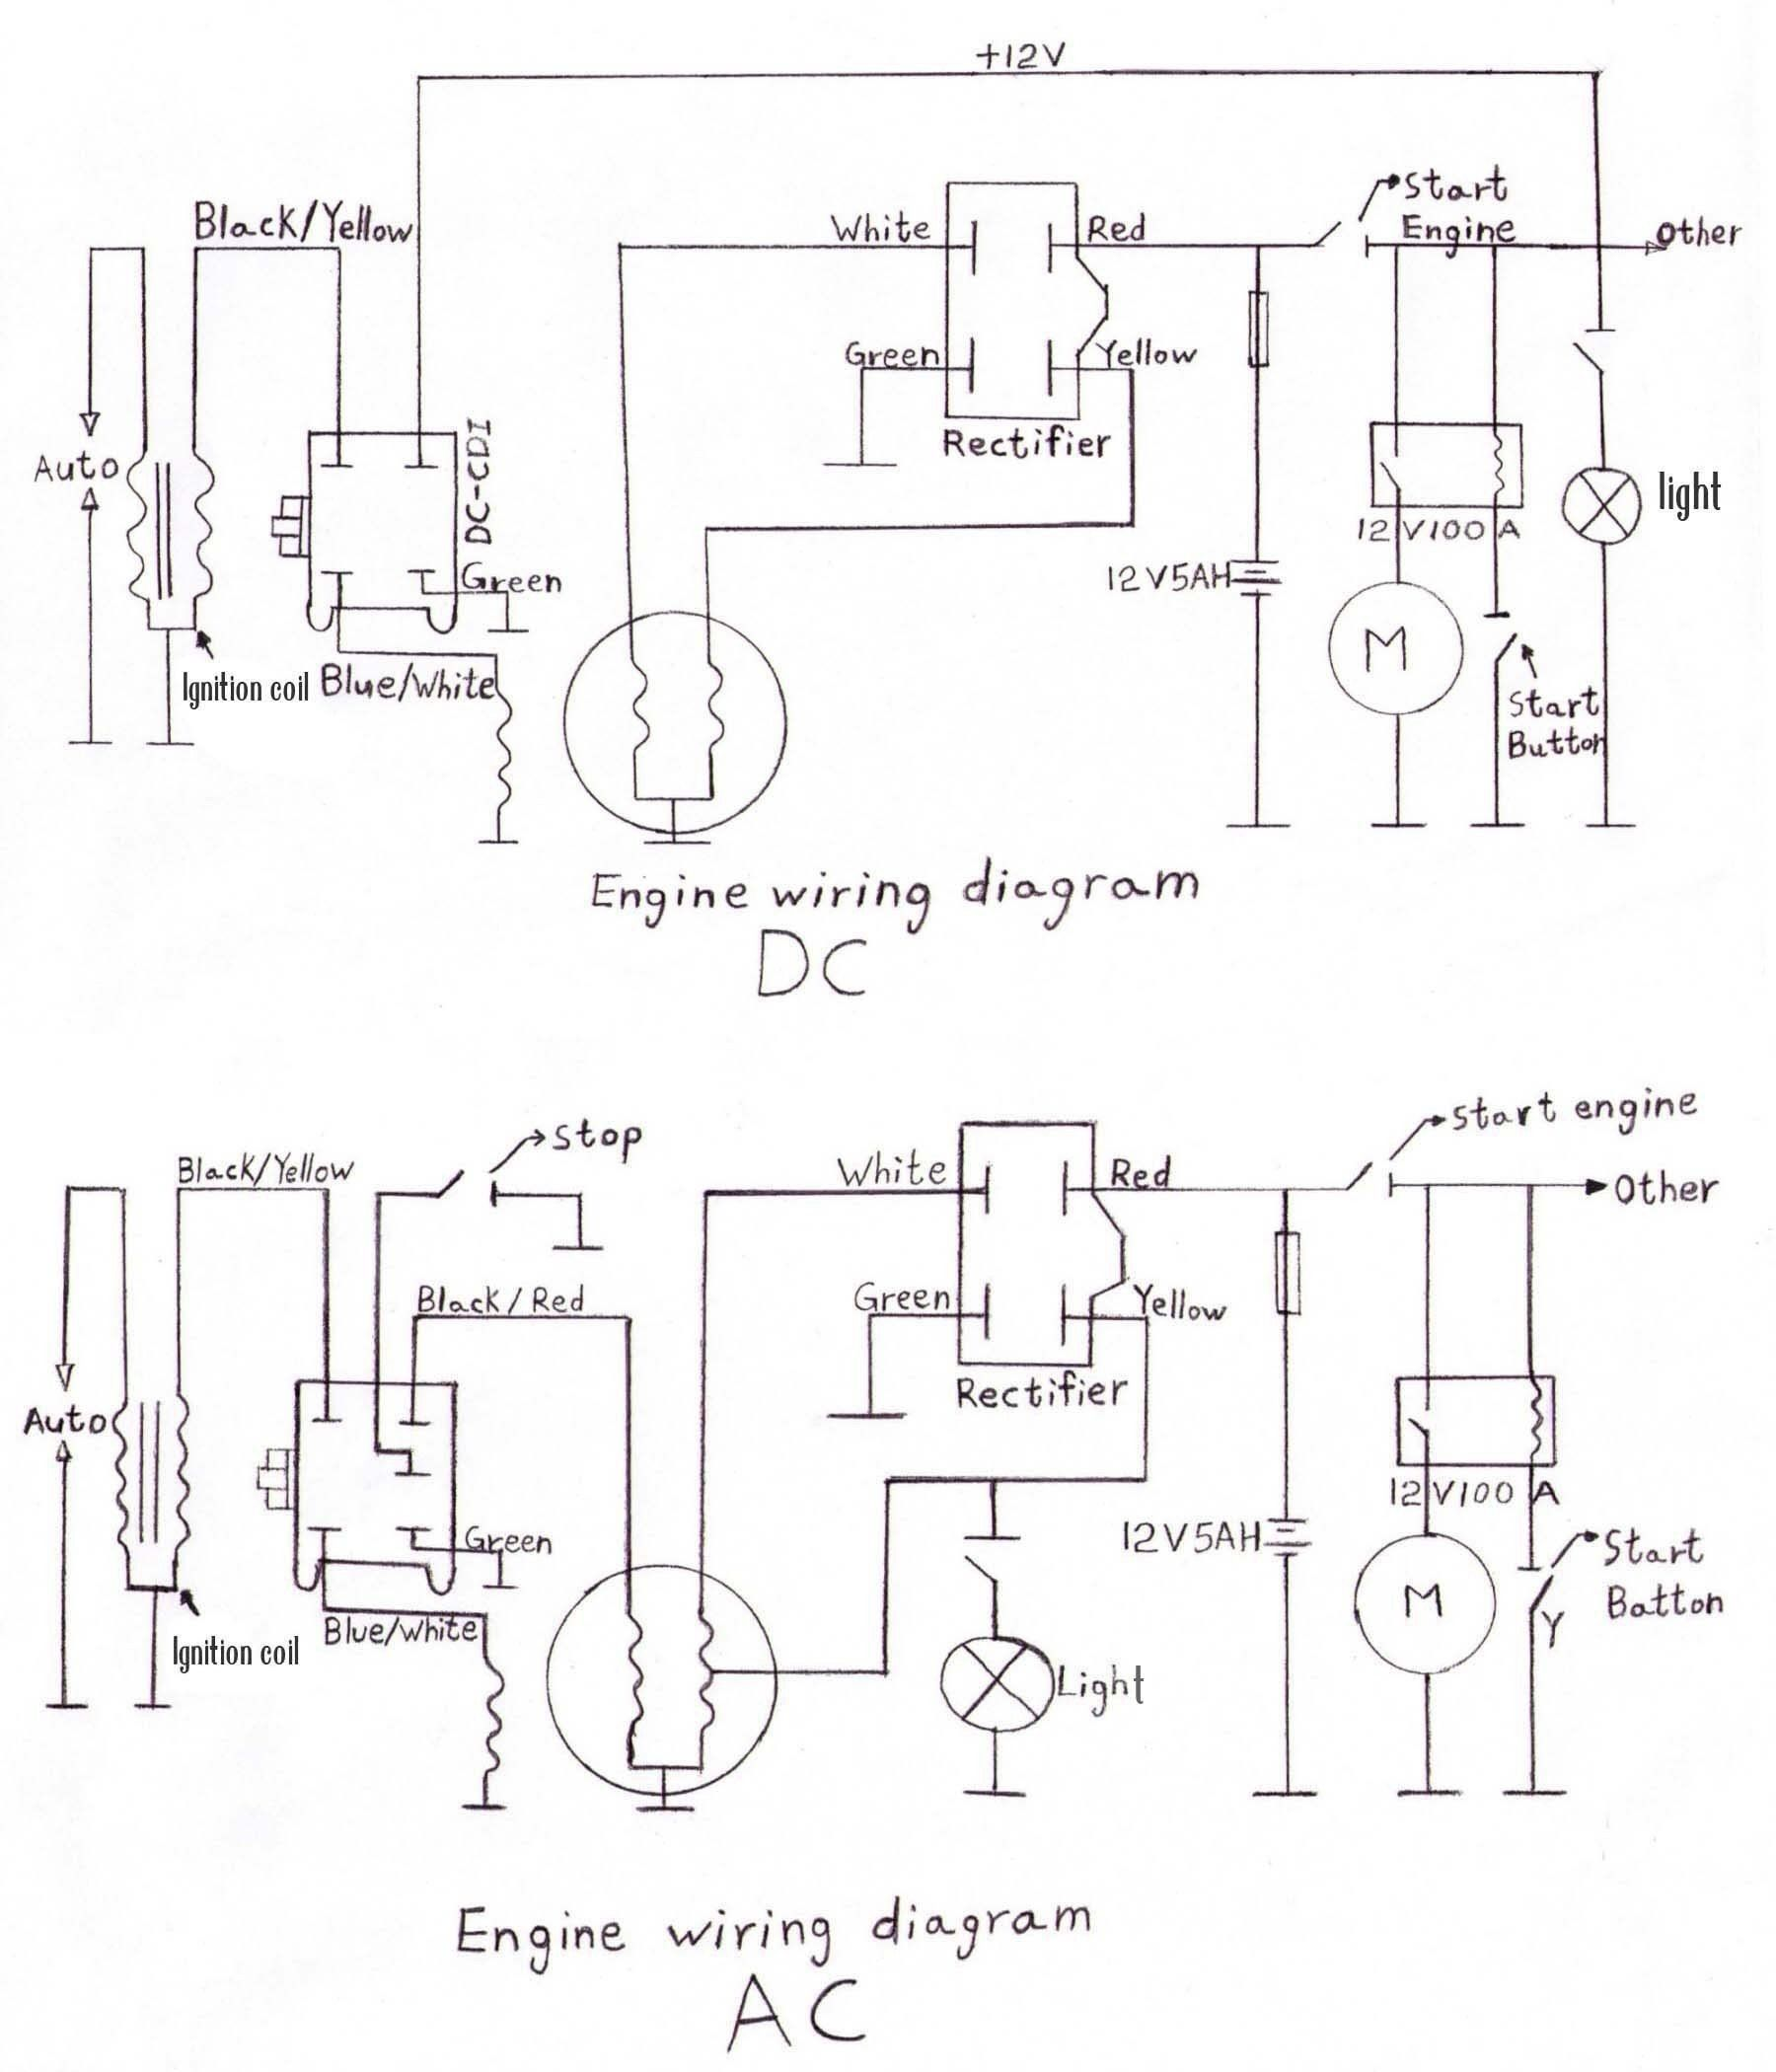 small resolution of lifan generator wiring diagram inspirationa lifan 125cc wiring throughout lifan 125 wiring diagram